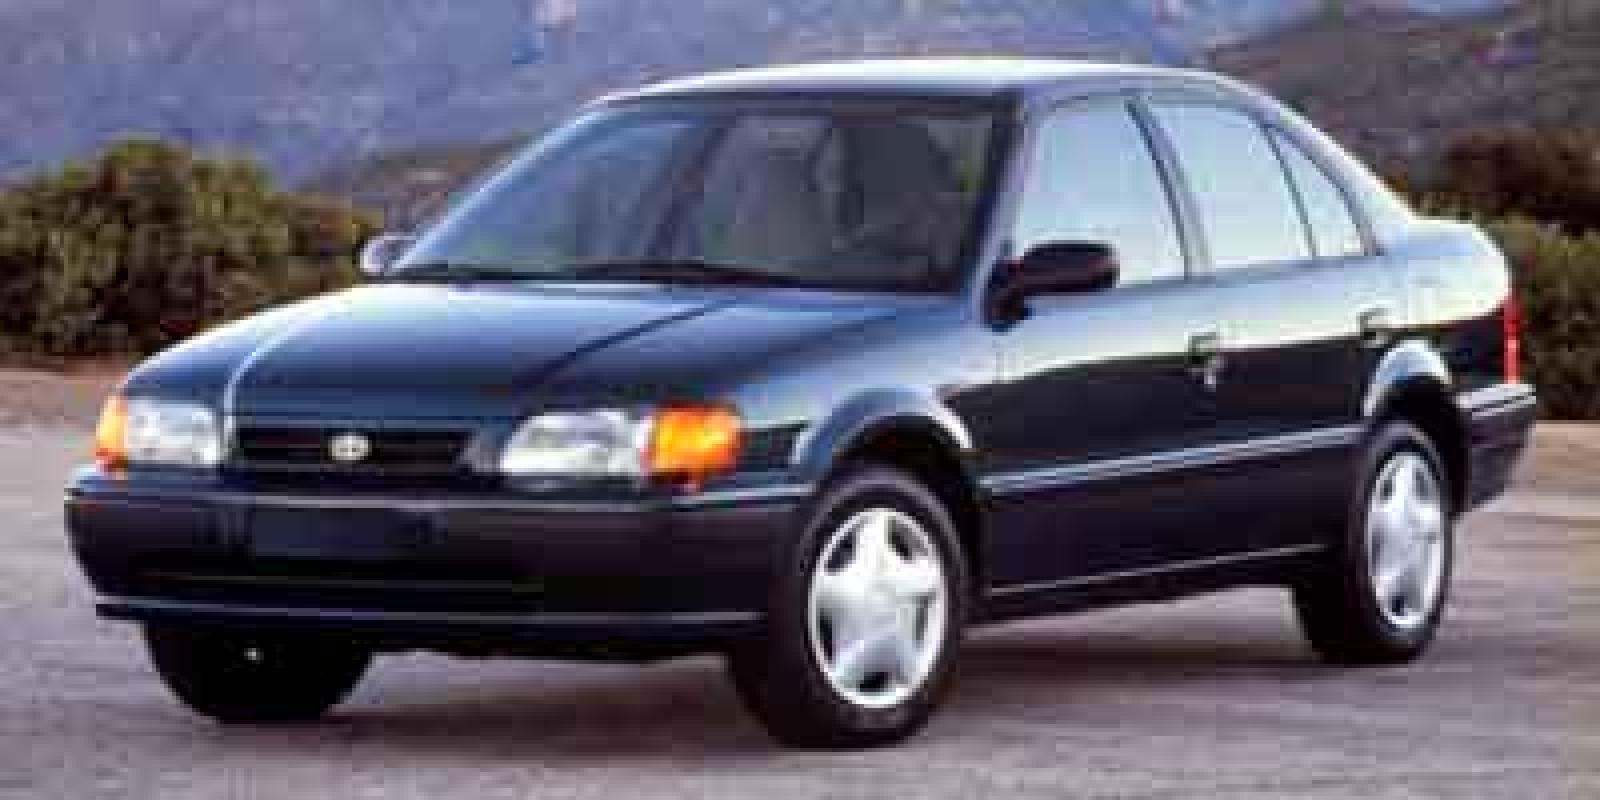 Toyota Tercel Handling Taken To The Next Level